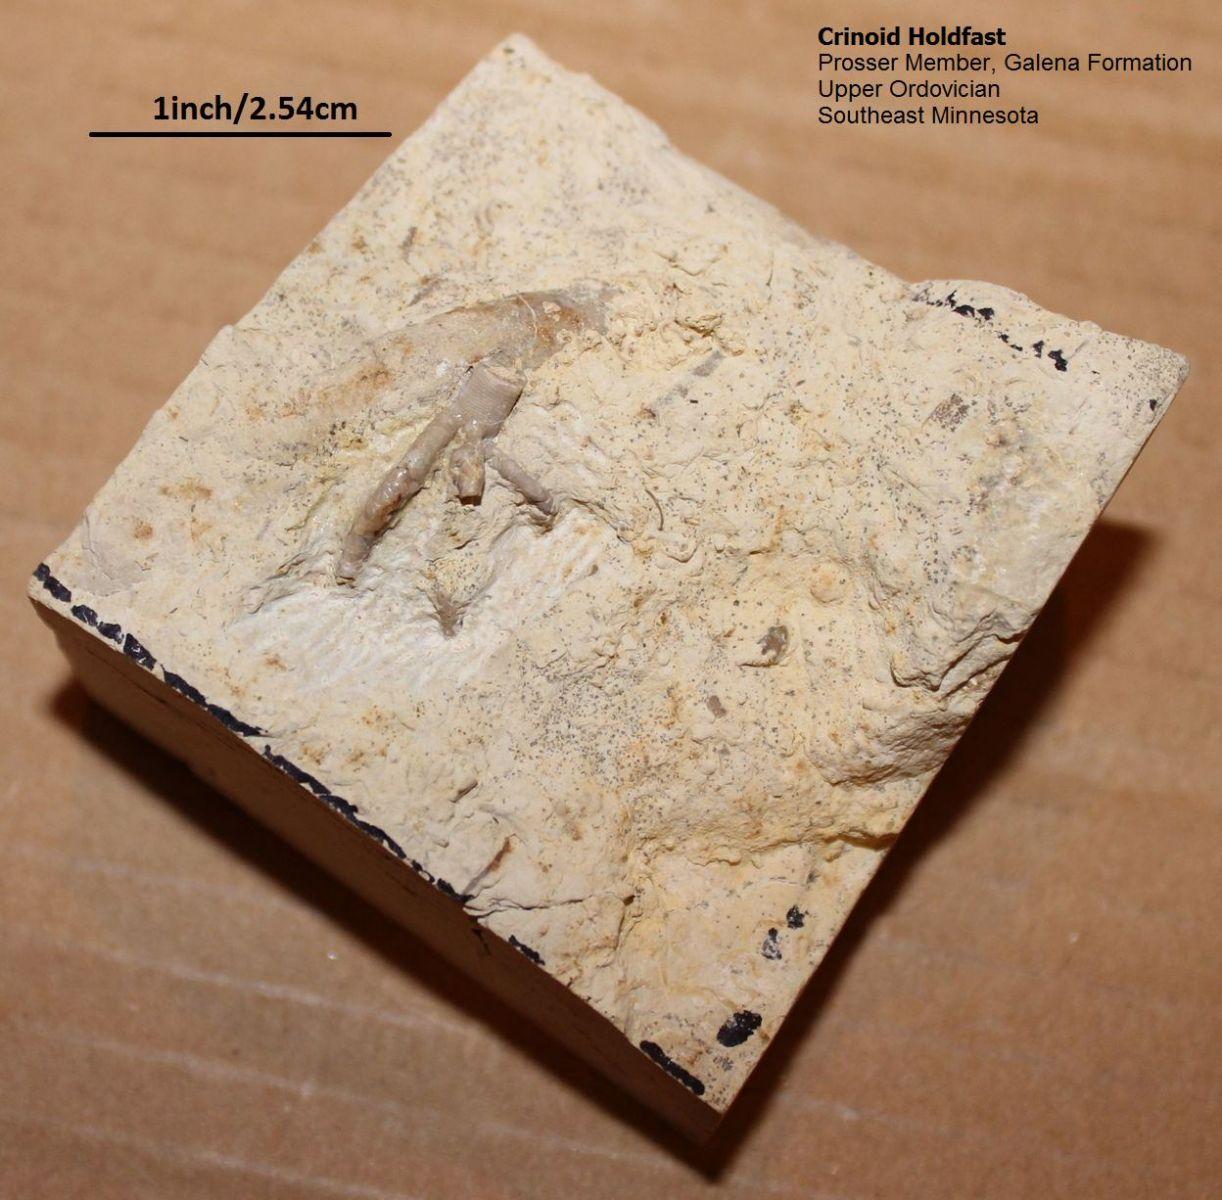 Crinoid Holdfast